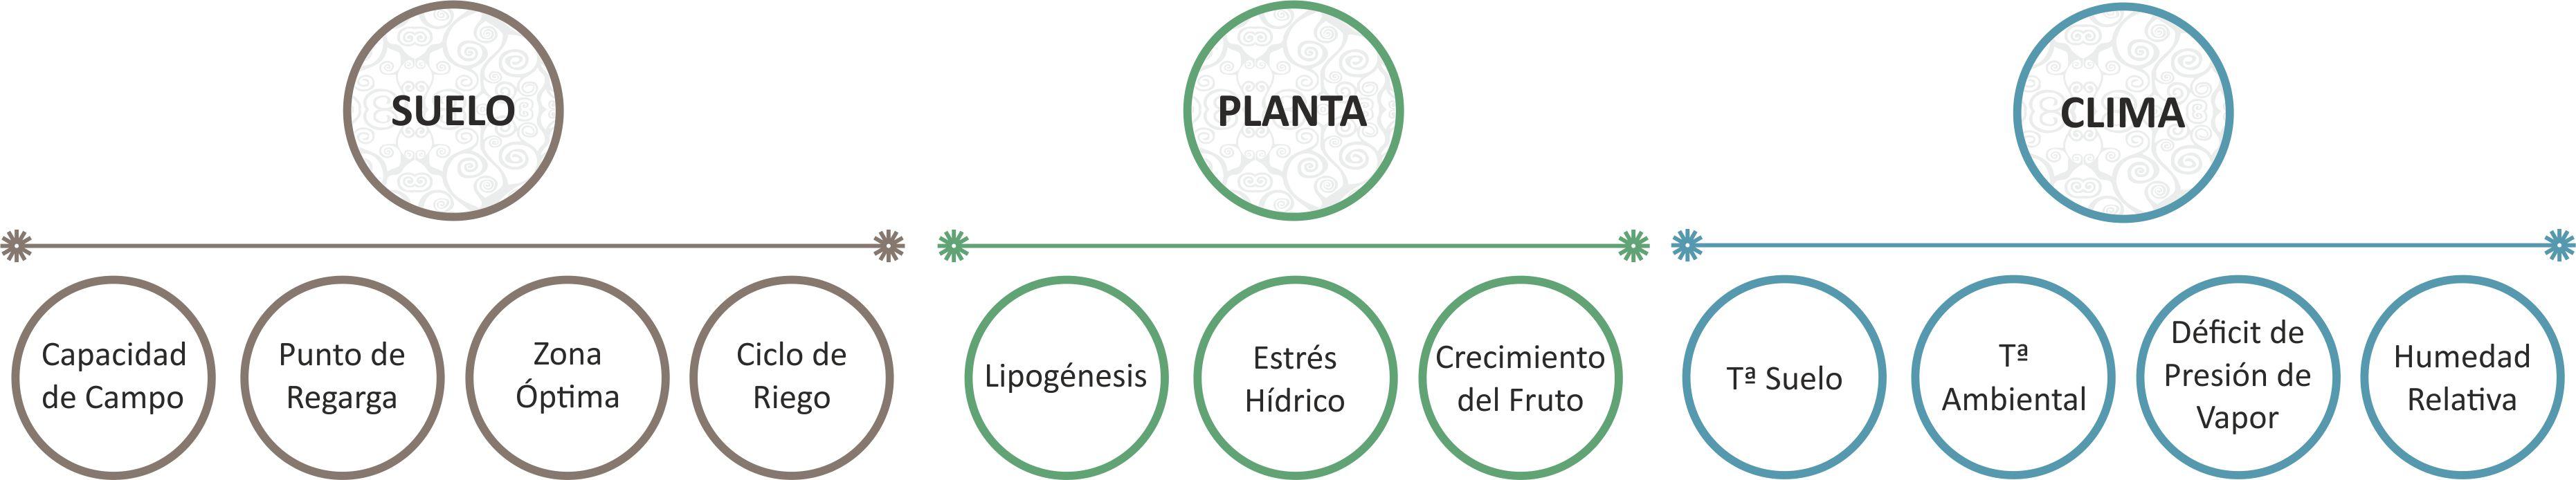 Parámetros Suelo-Planta-Clima by AGROCONSULTING